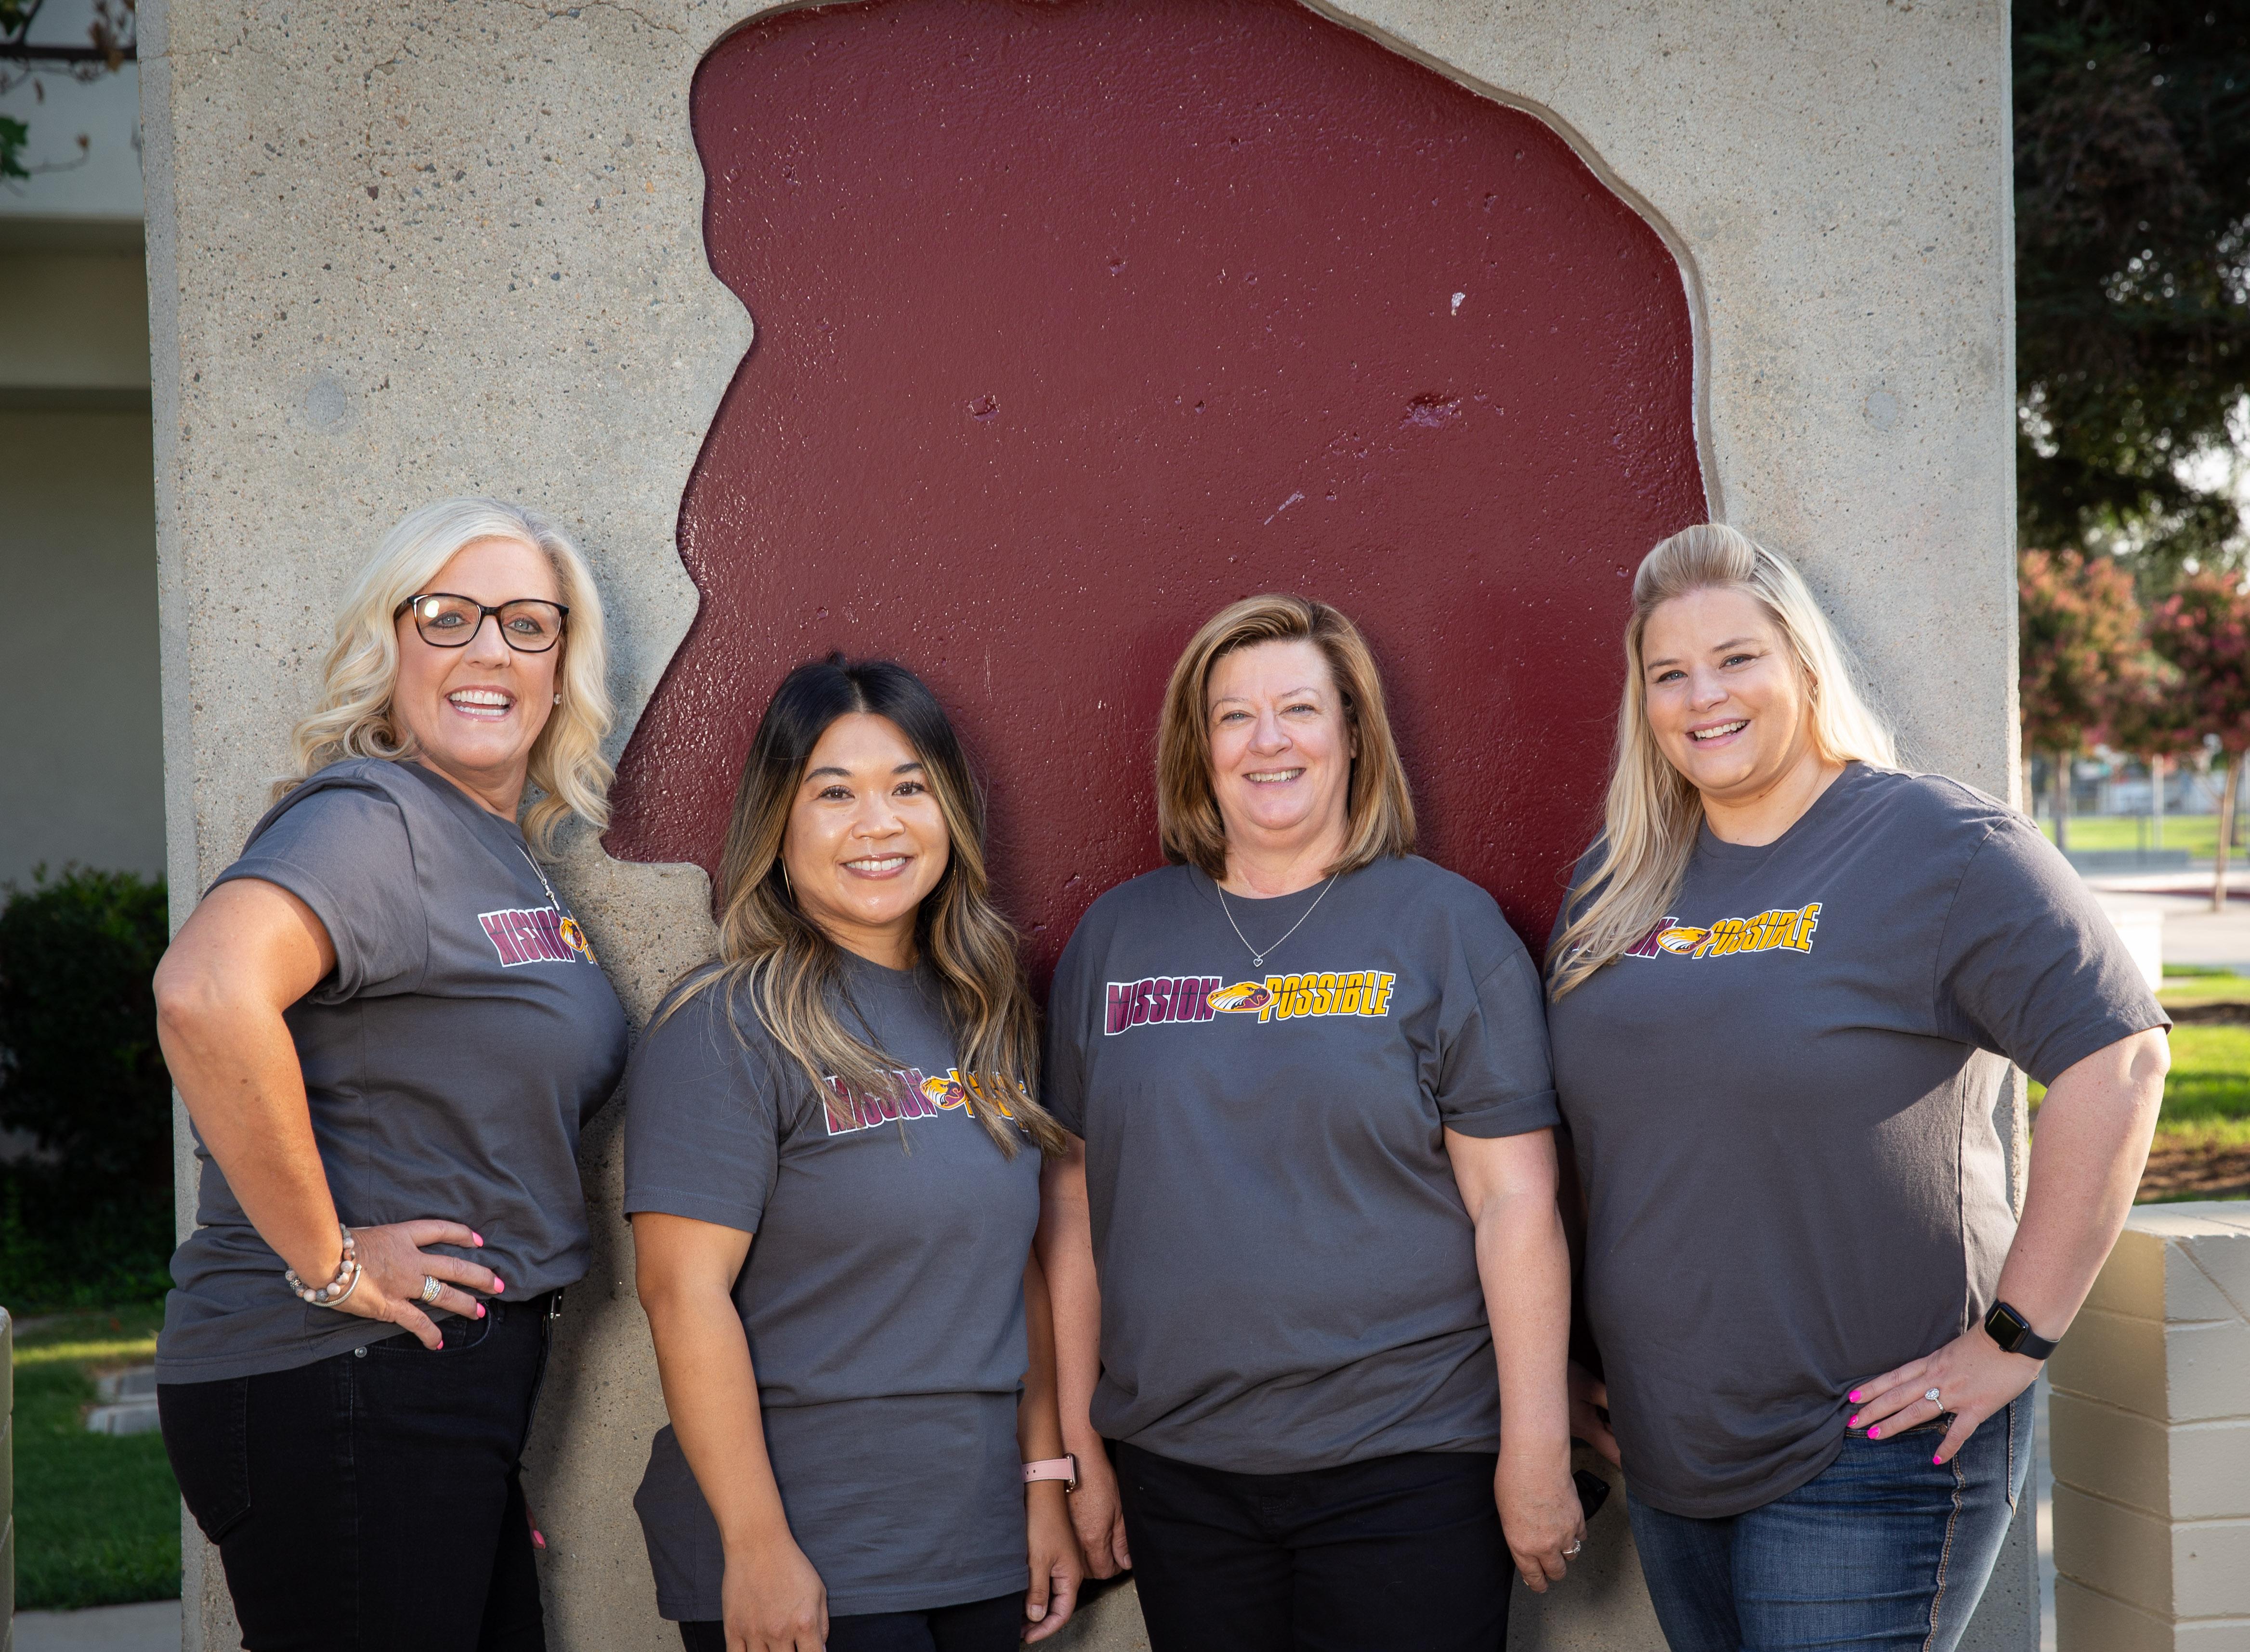 Kindergarten teachers Debora Keeney, Charinee Williams, Linda Mesrobian, and Ashley Weldon